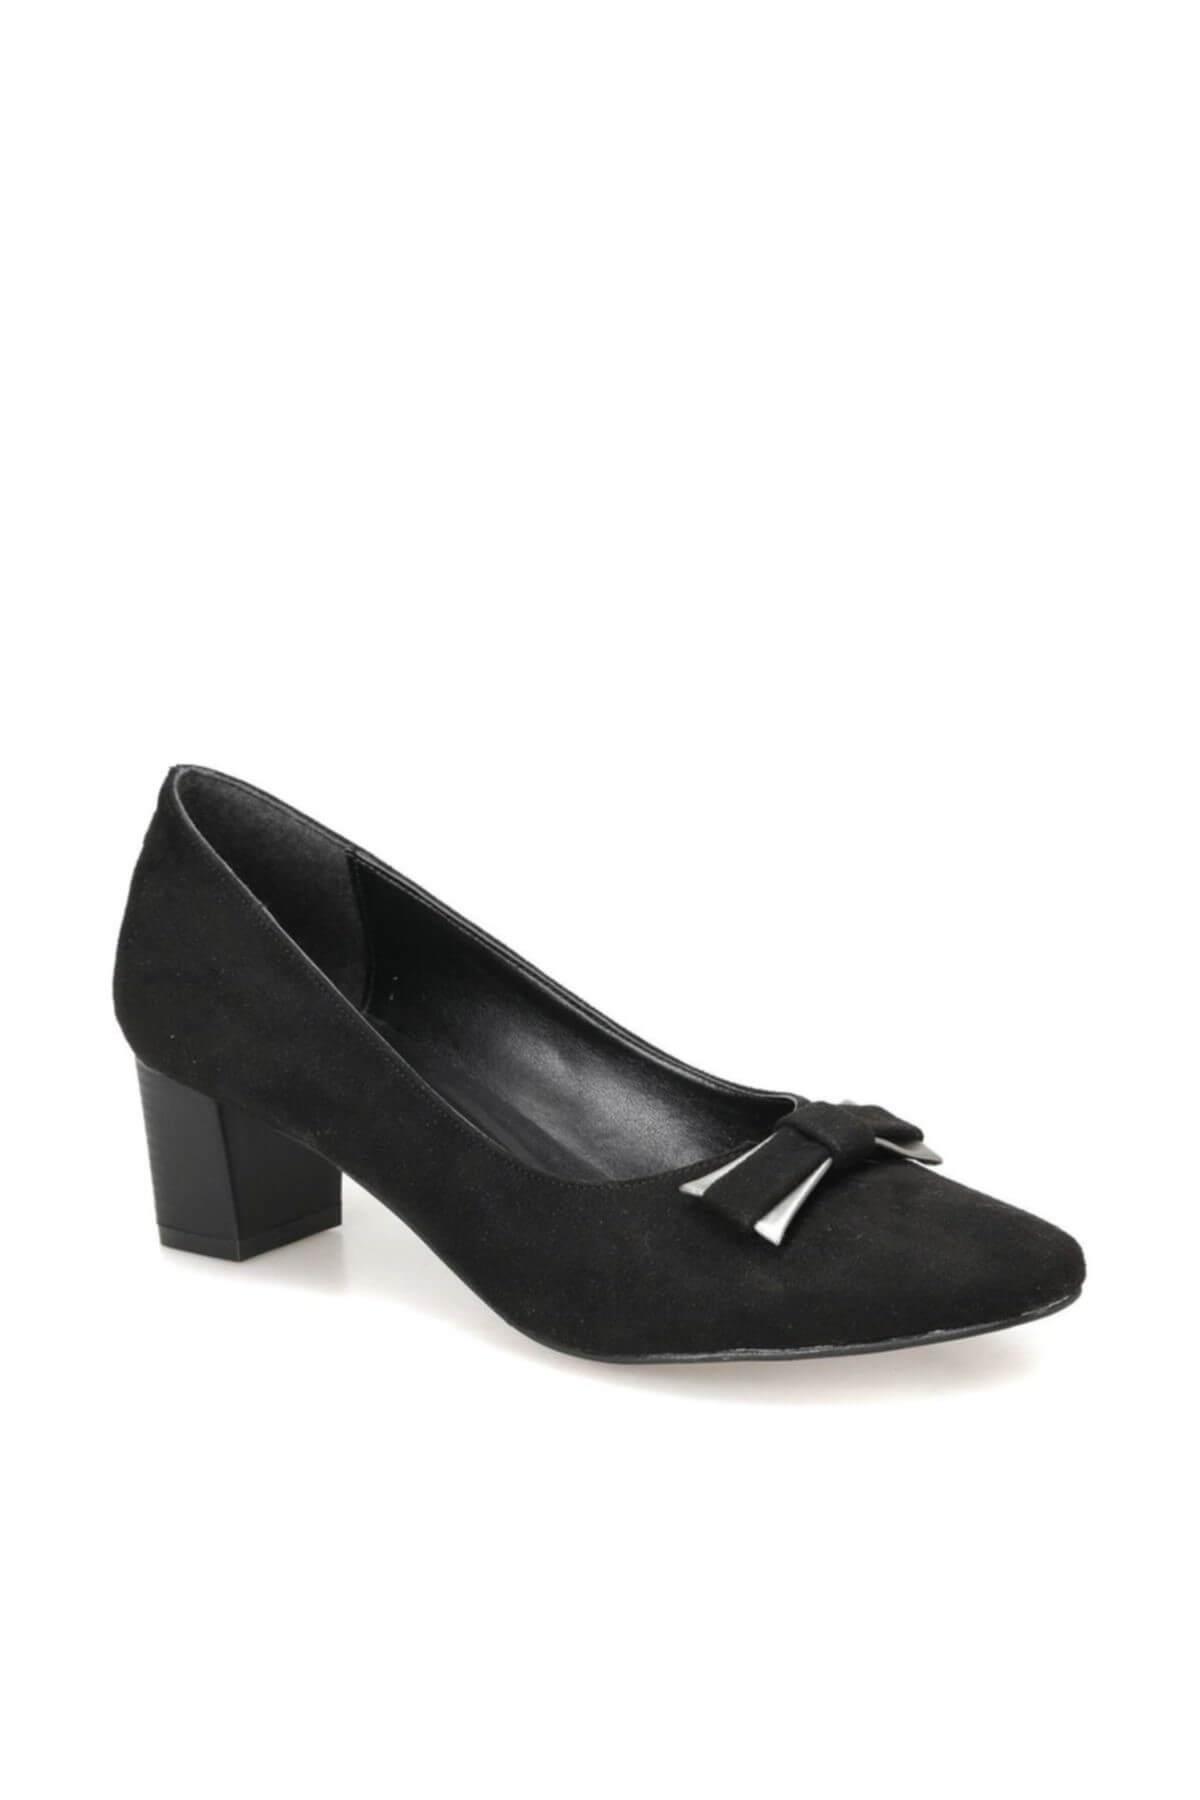 Miss F DW18033 Siyah Kadın Topuklu Ayakkabı 100340763 1